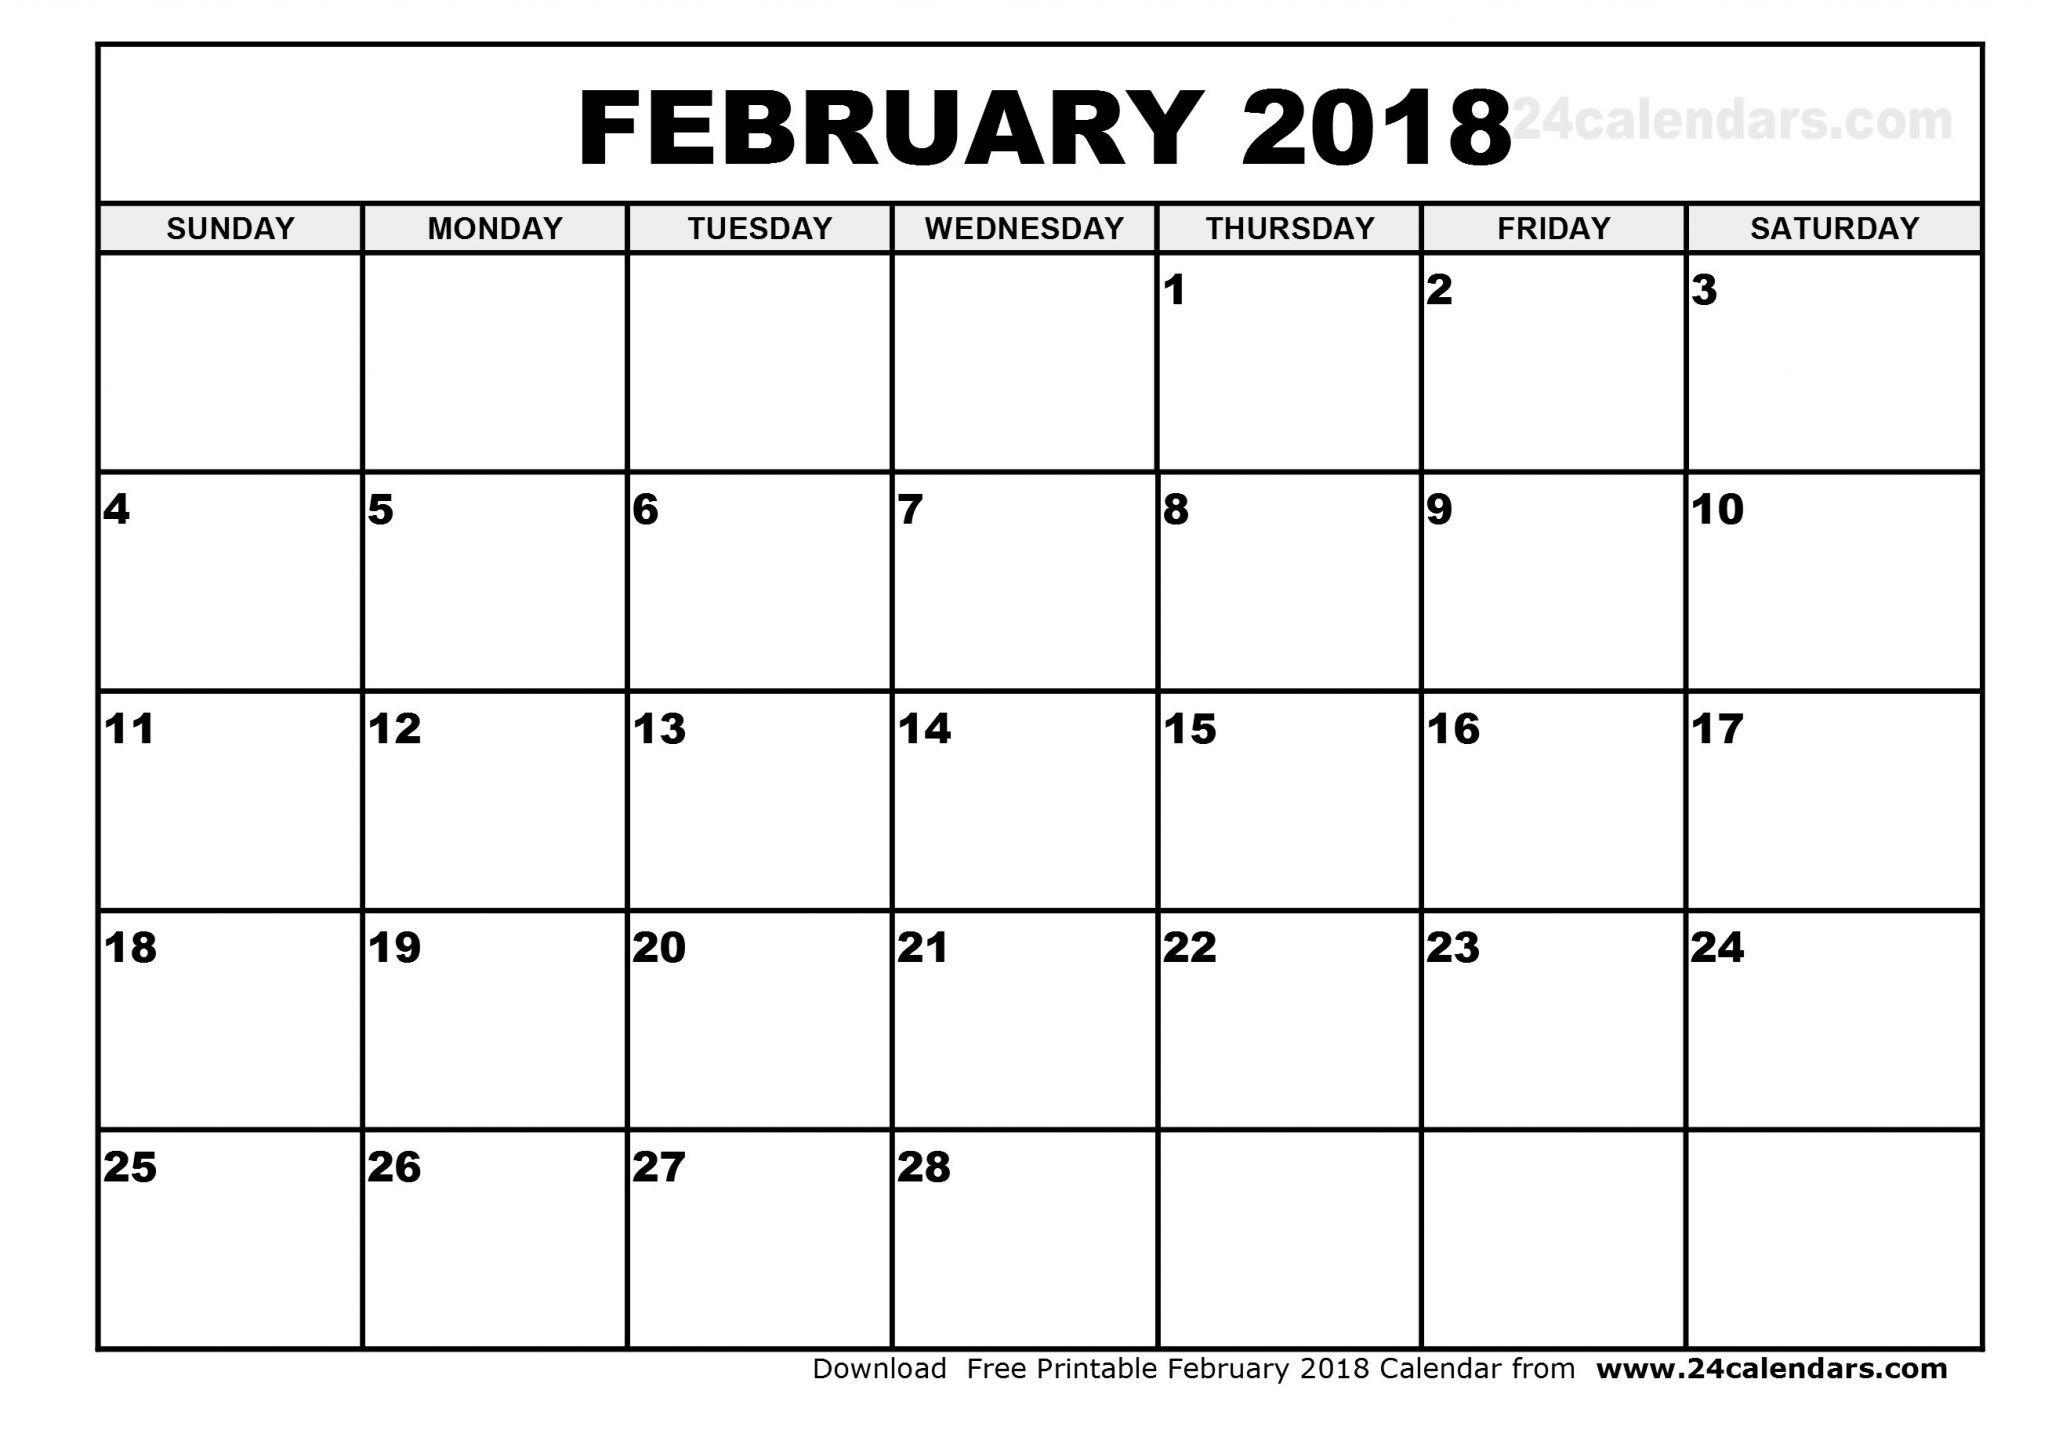 Blank February 2019 Calendar Printable | Free Printable February throughout A3 Calendar Template Printable